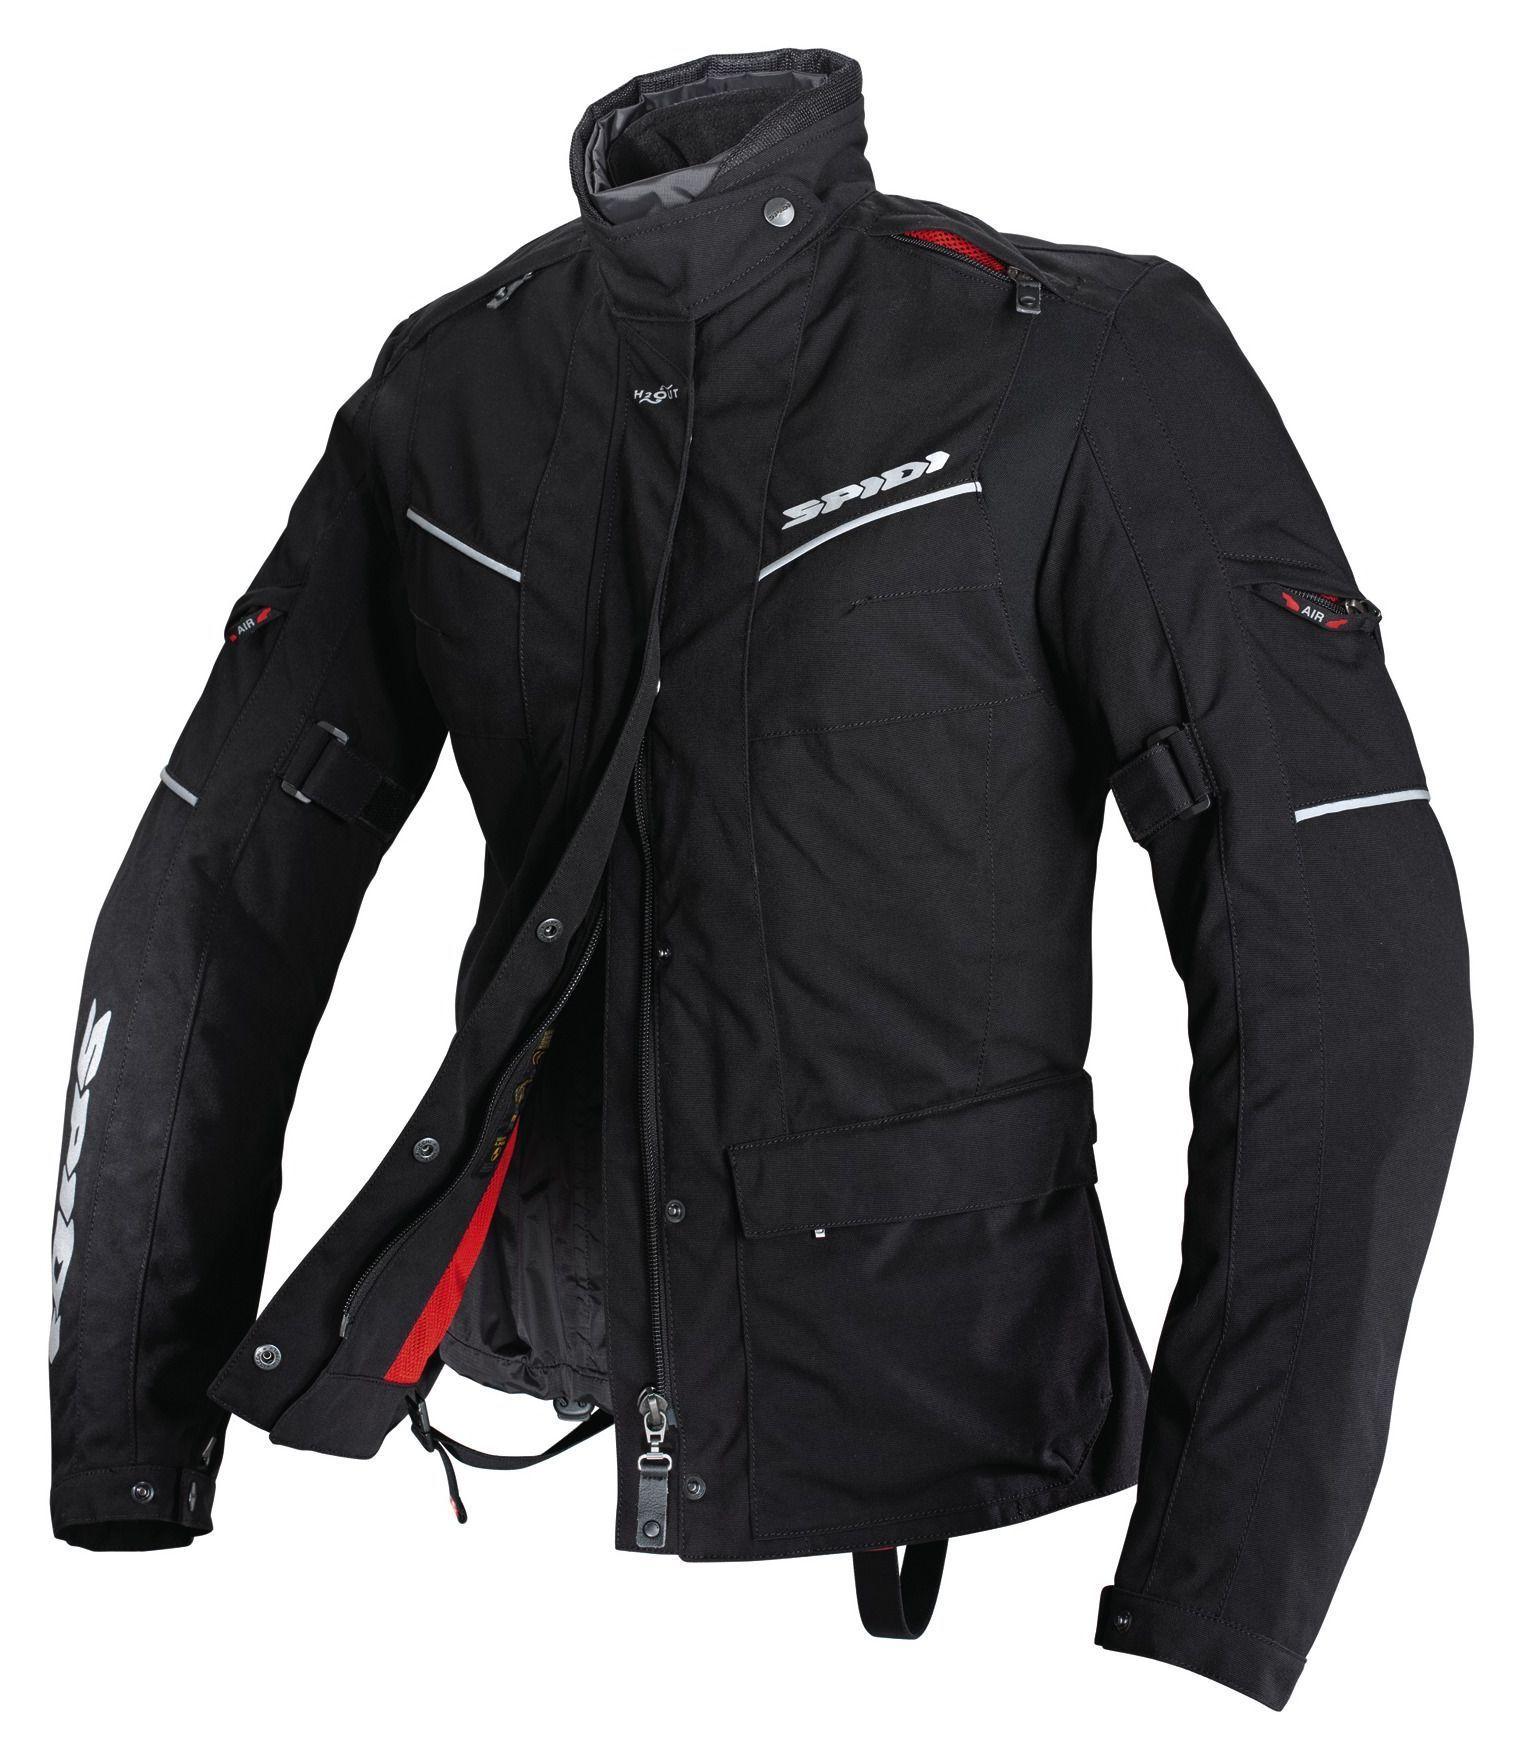 Spidi Venture H2OUT Womens Jacket RevZilla